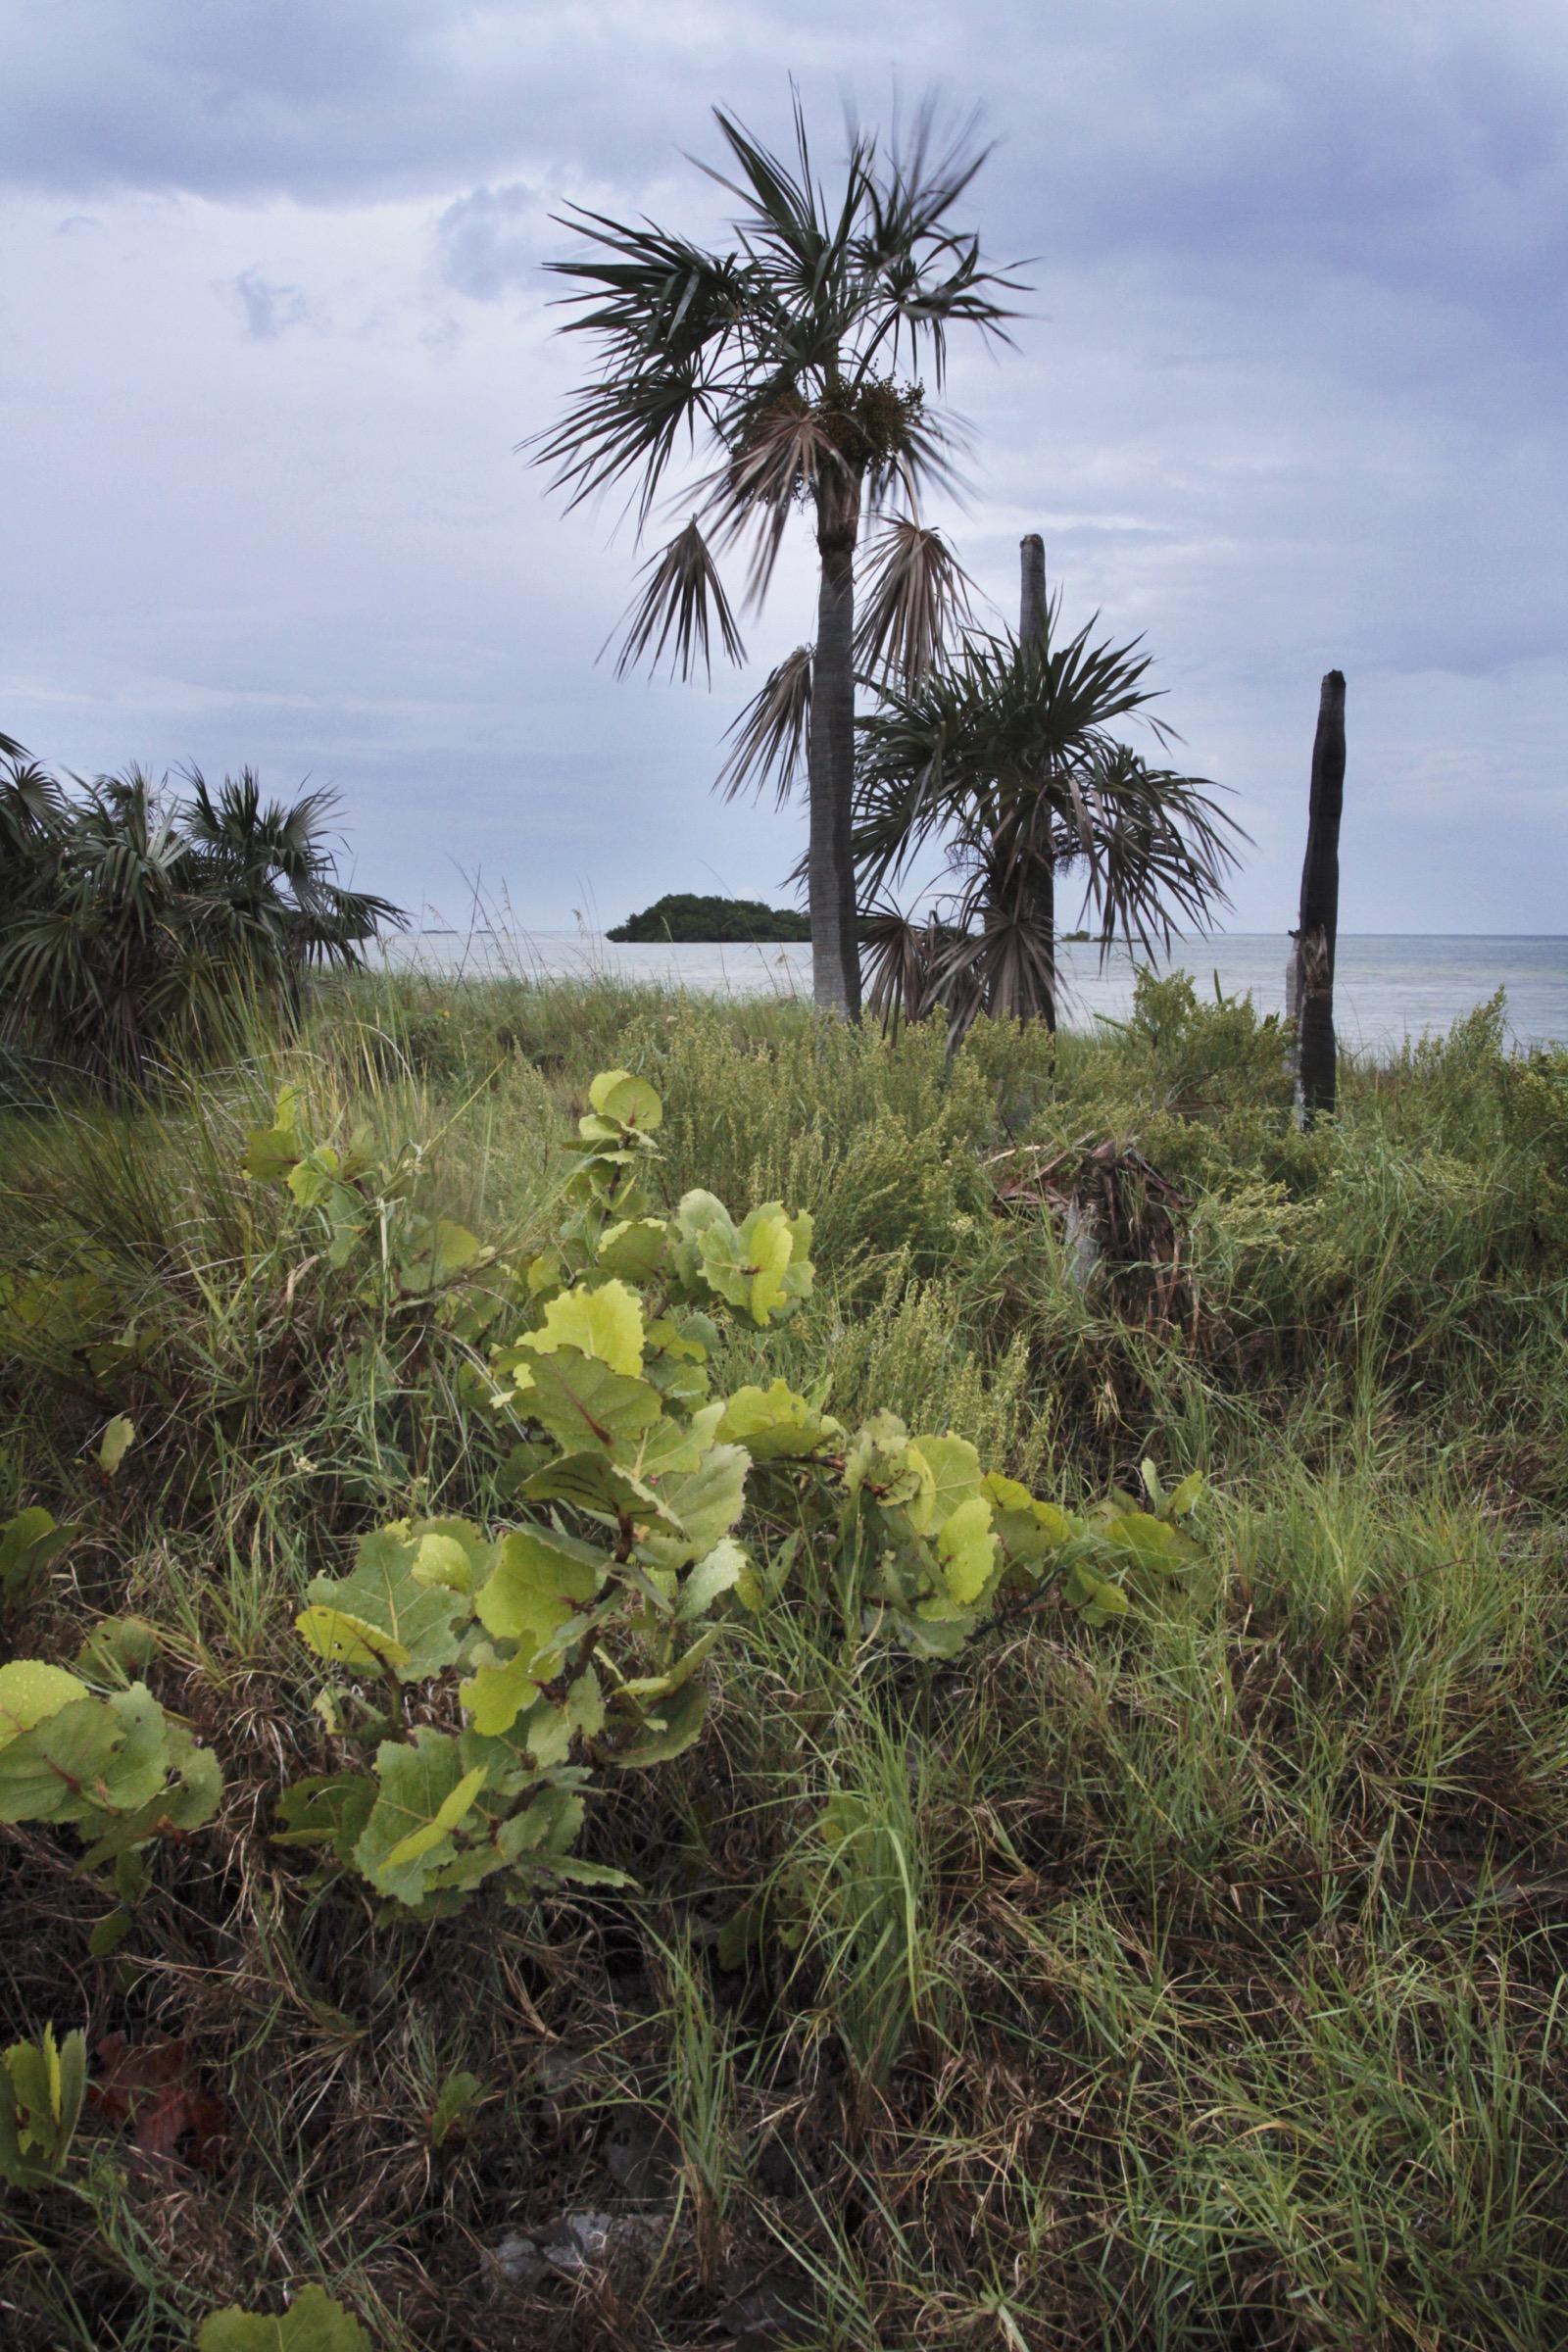 Habitat containing important host plants, like Florida Keys blackbead and gray nickerbean, can still be found on remote keys like Bahia Honda. Photograph by Chad Anderson